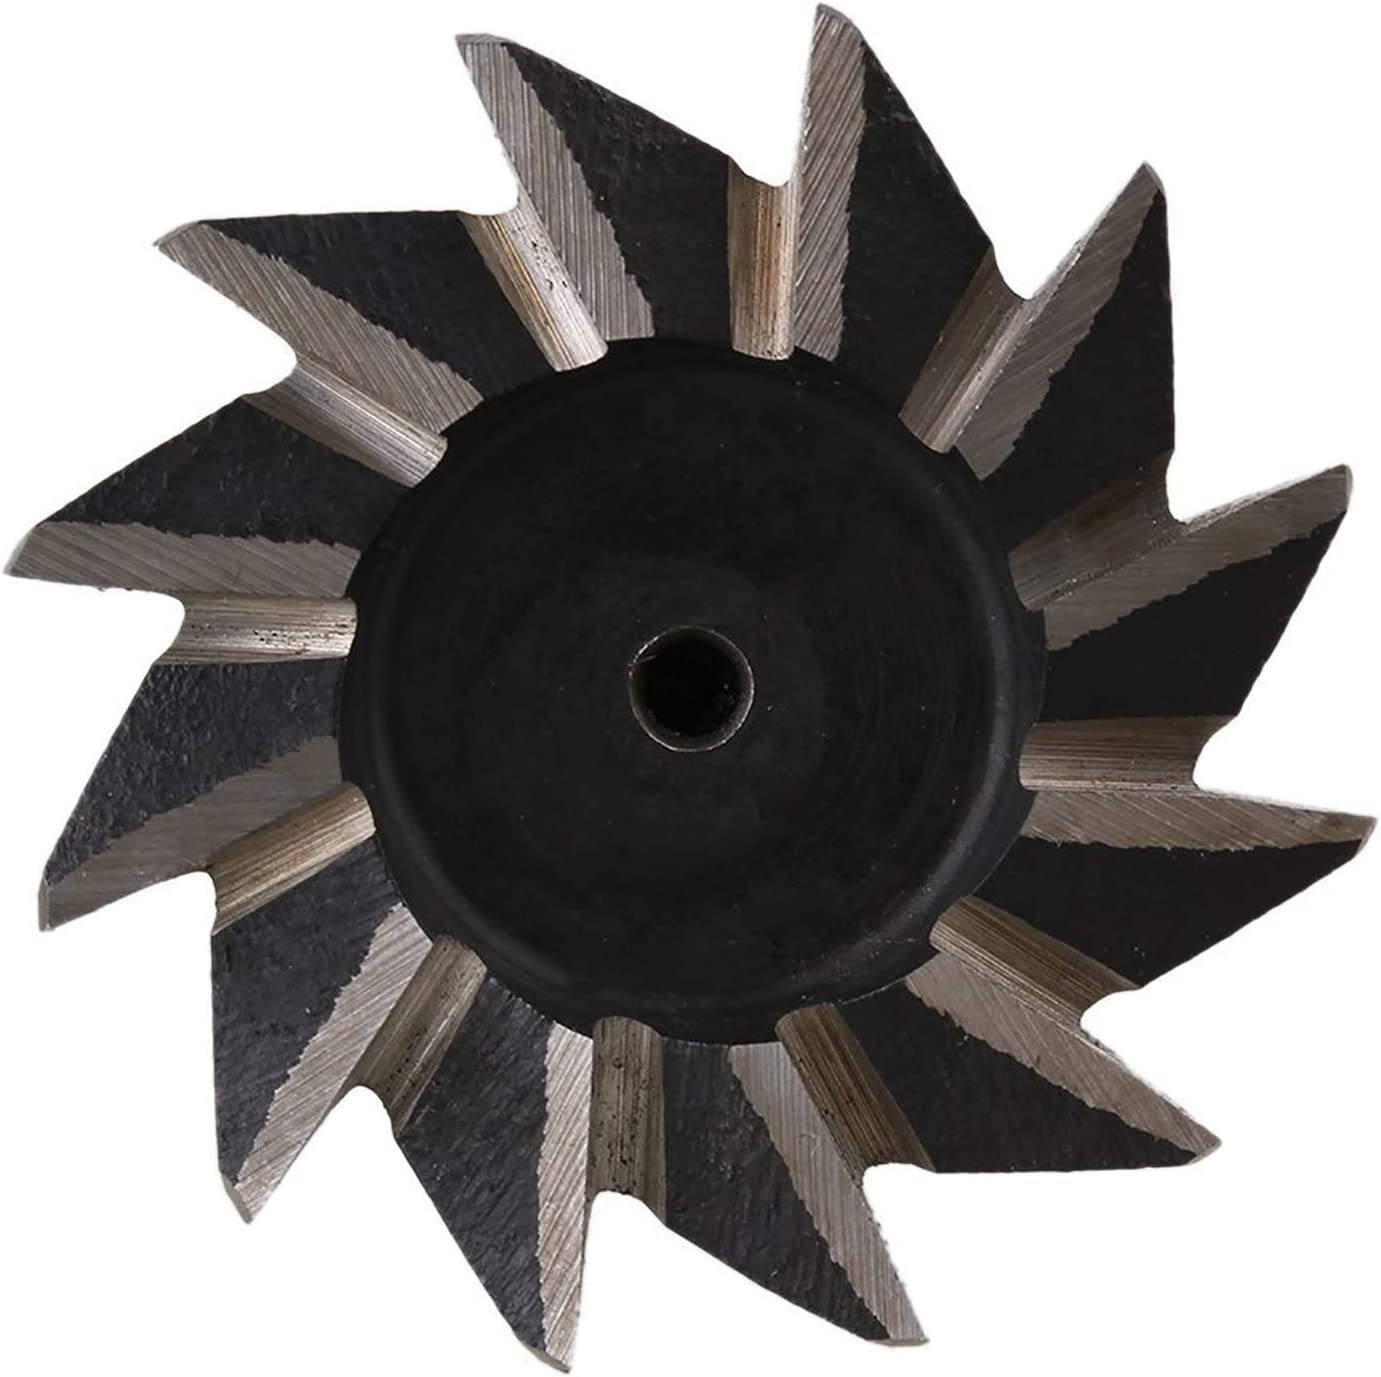 cortador de ranura de cola de milano HSS mango recto cortador de ranura de cola de milano CNC Bit 10mm* 45/° molino de extremo